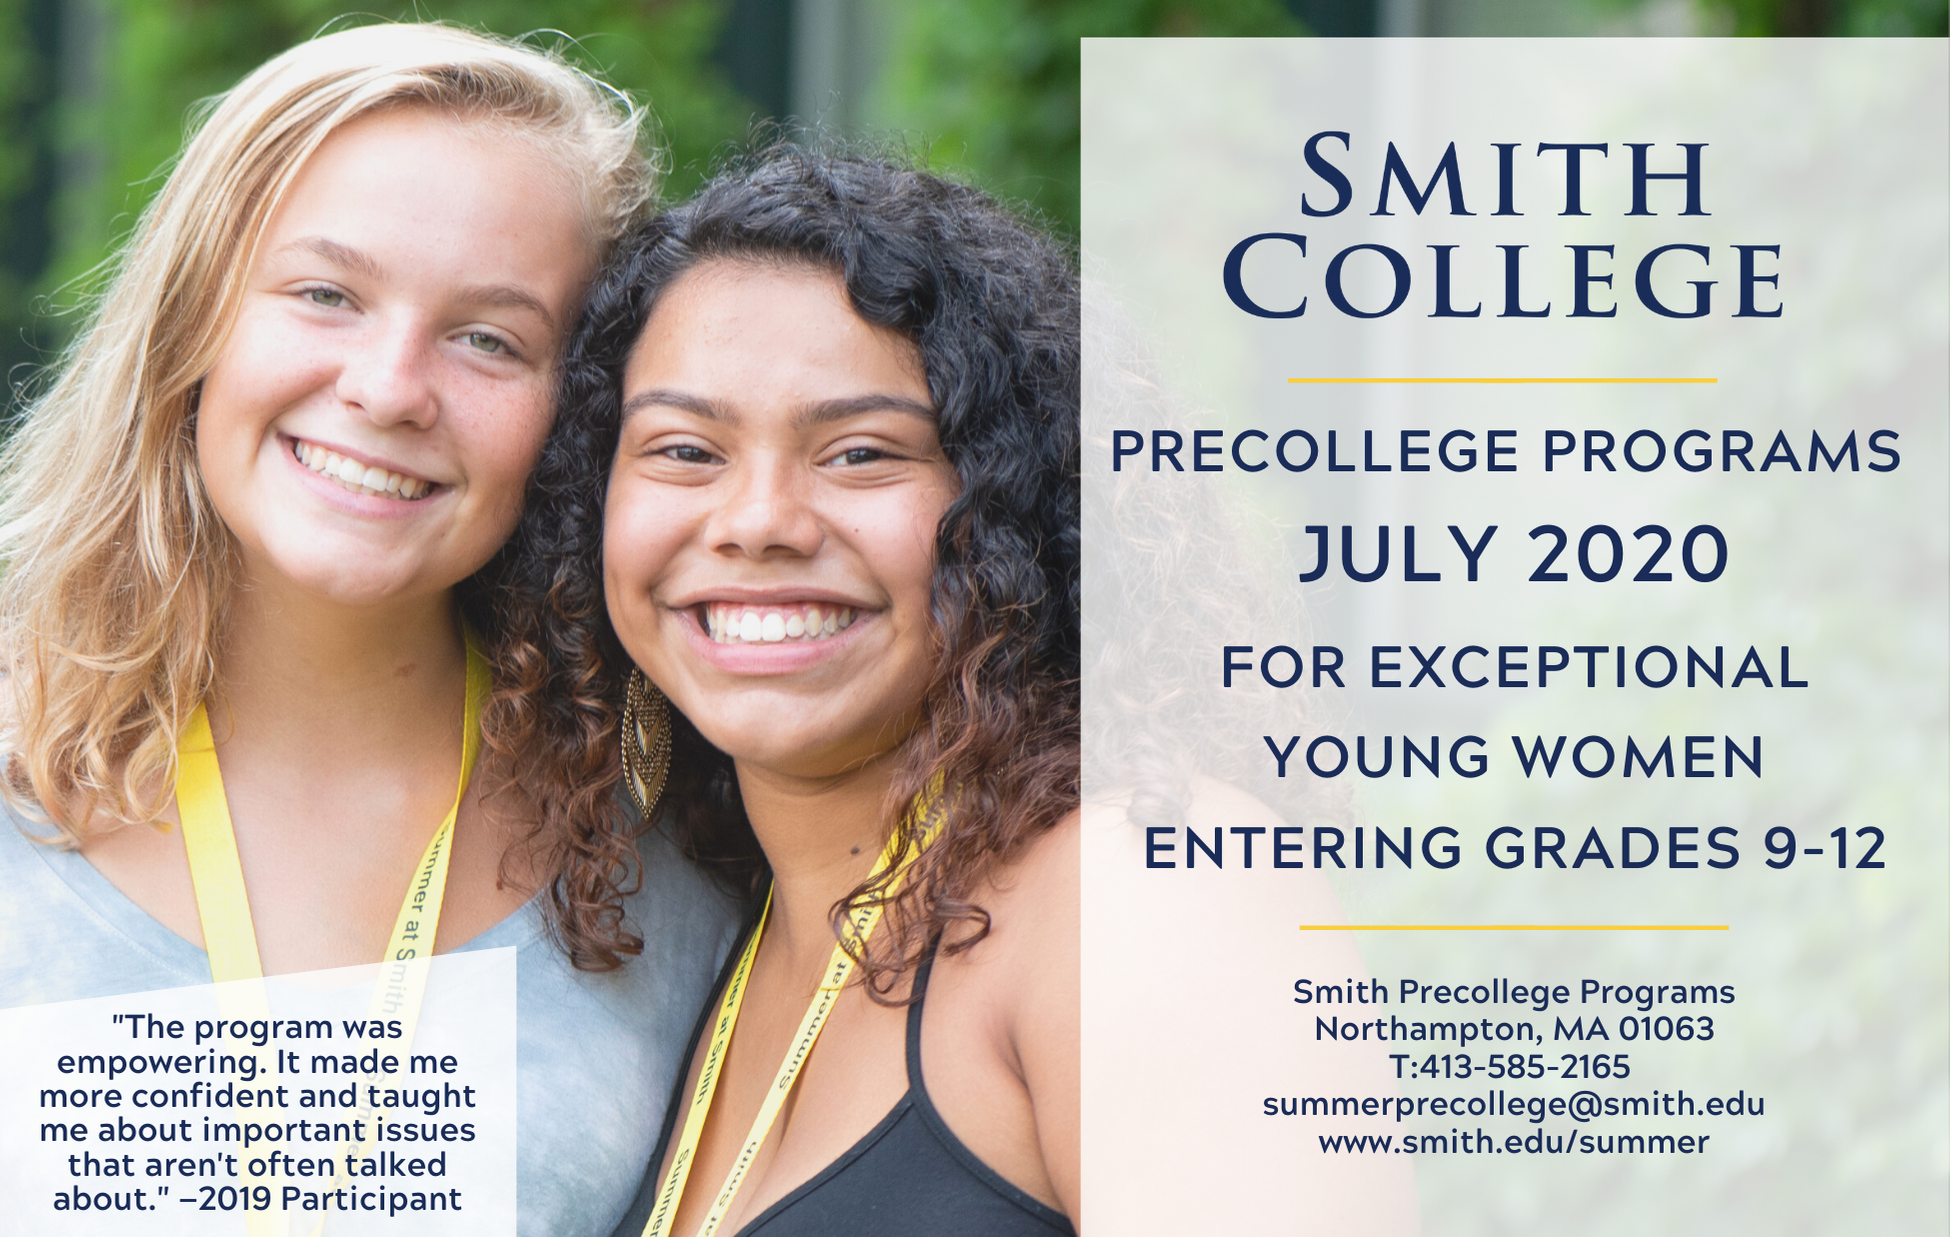 Summer Program - Writing   Smith Precollege Summer Programs